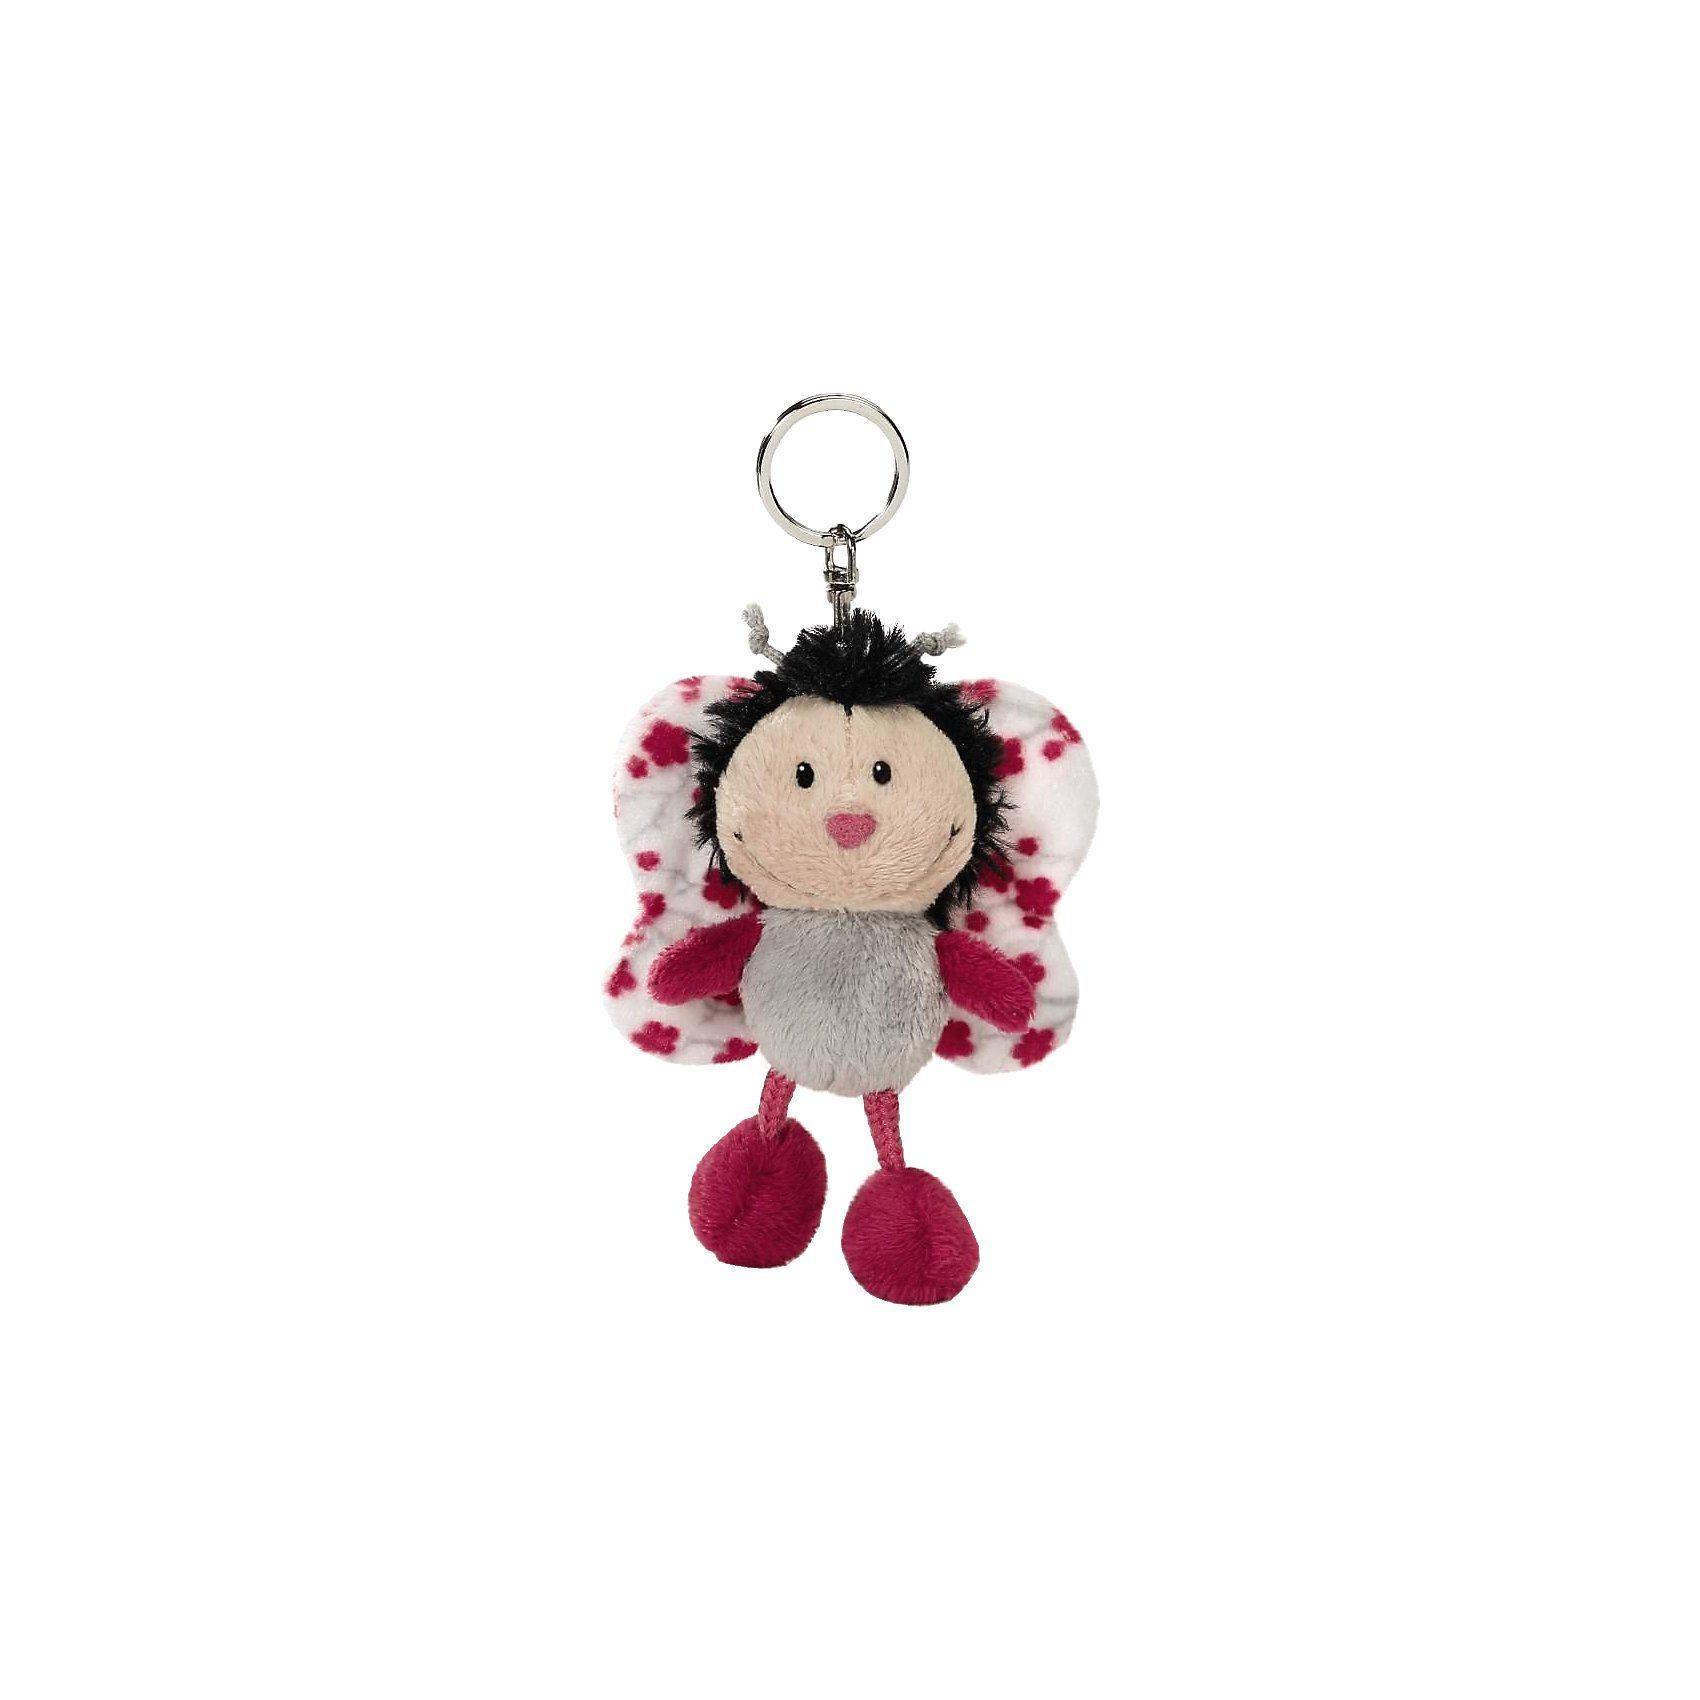 NICI Schmetterling Bean Bag Schlüsselanhänger (38824)